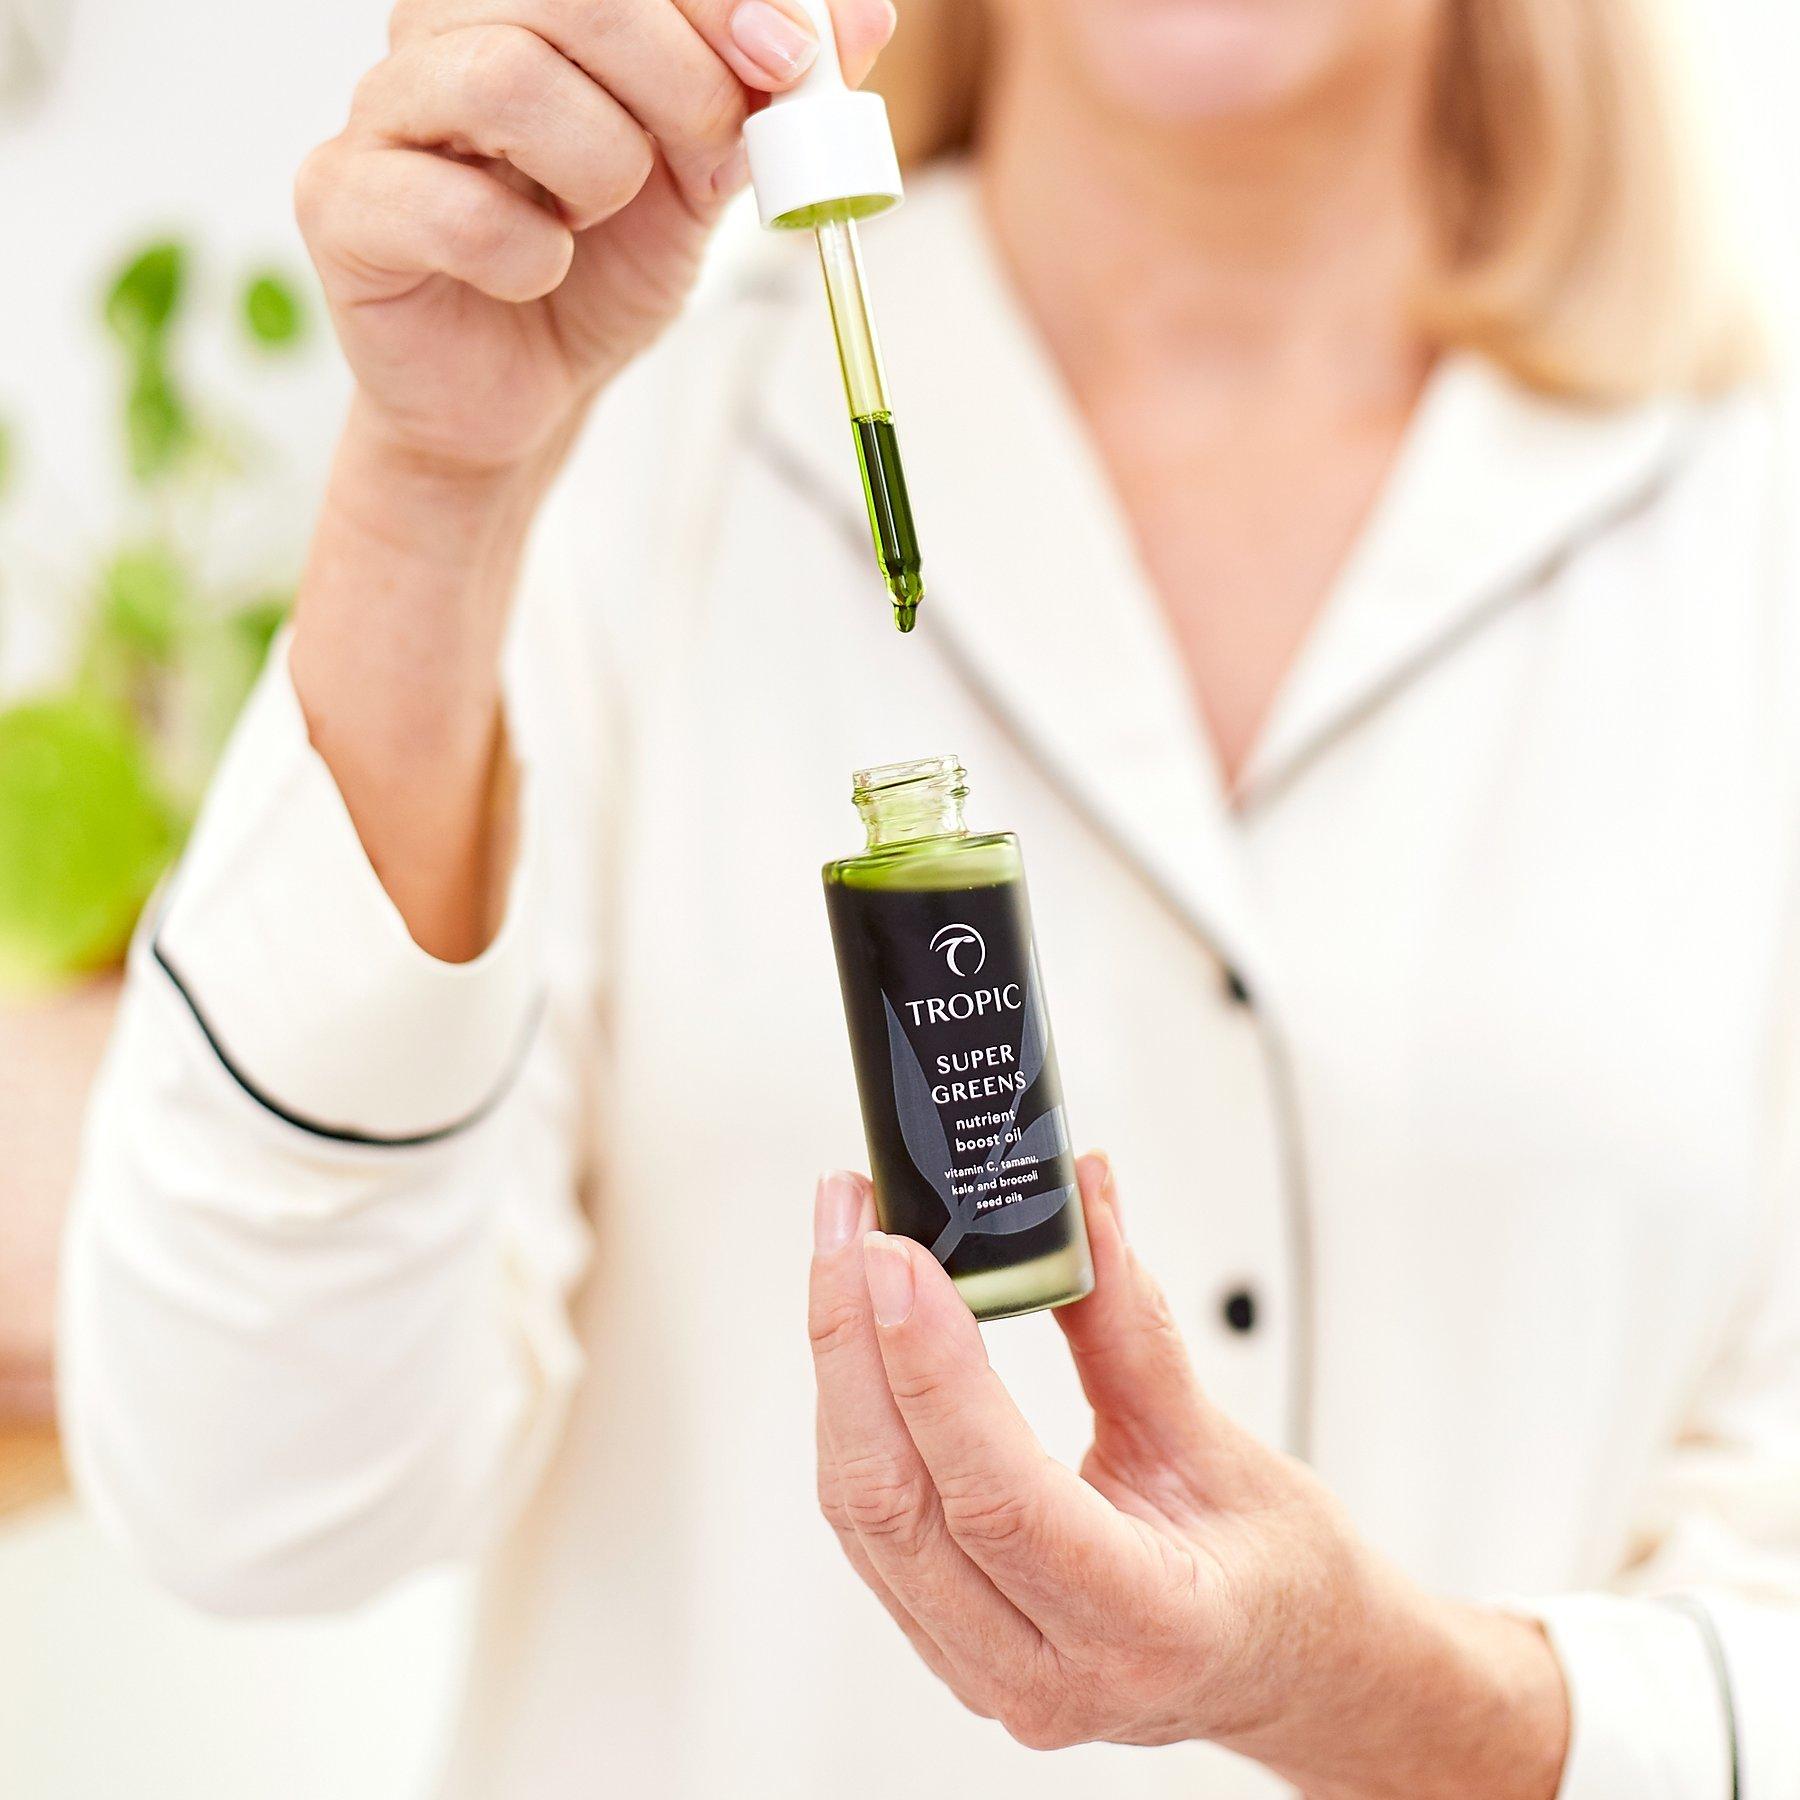 woman holding bottle of super greens skin serum